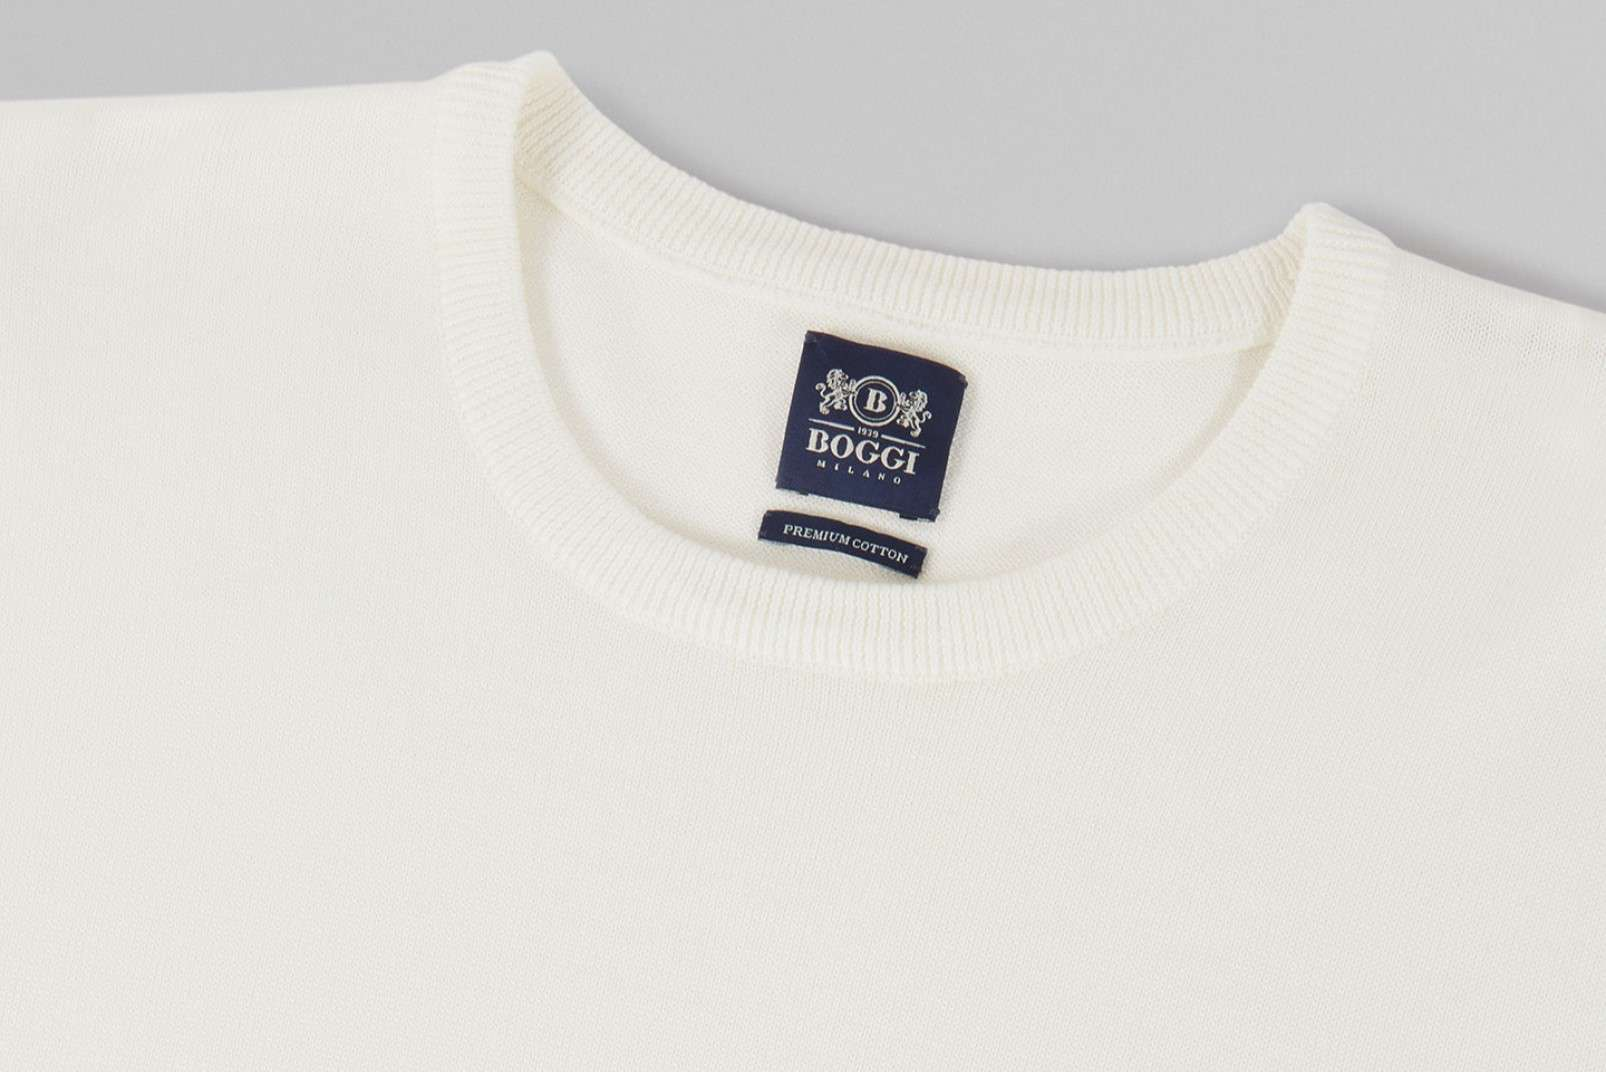 Boggi Milano Pima cotton knitwear BO19P037105